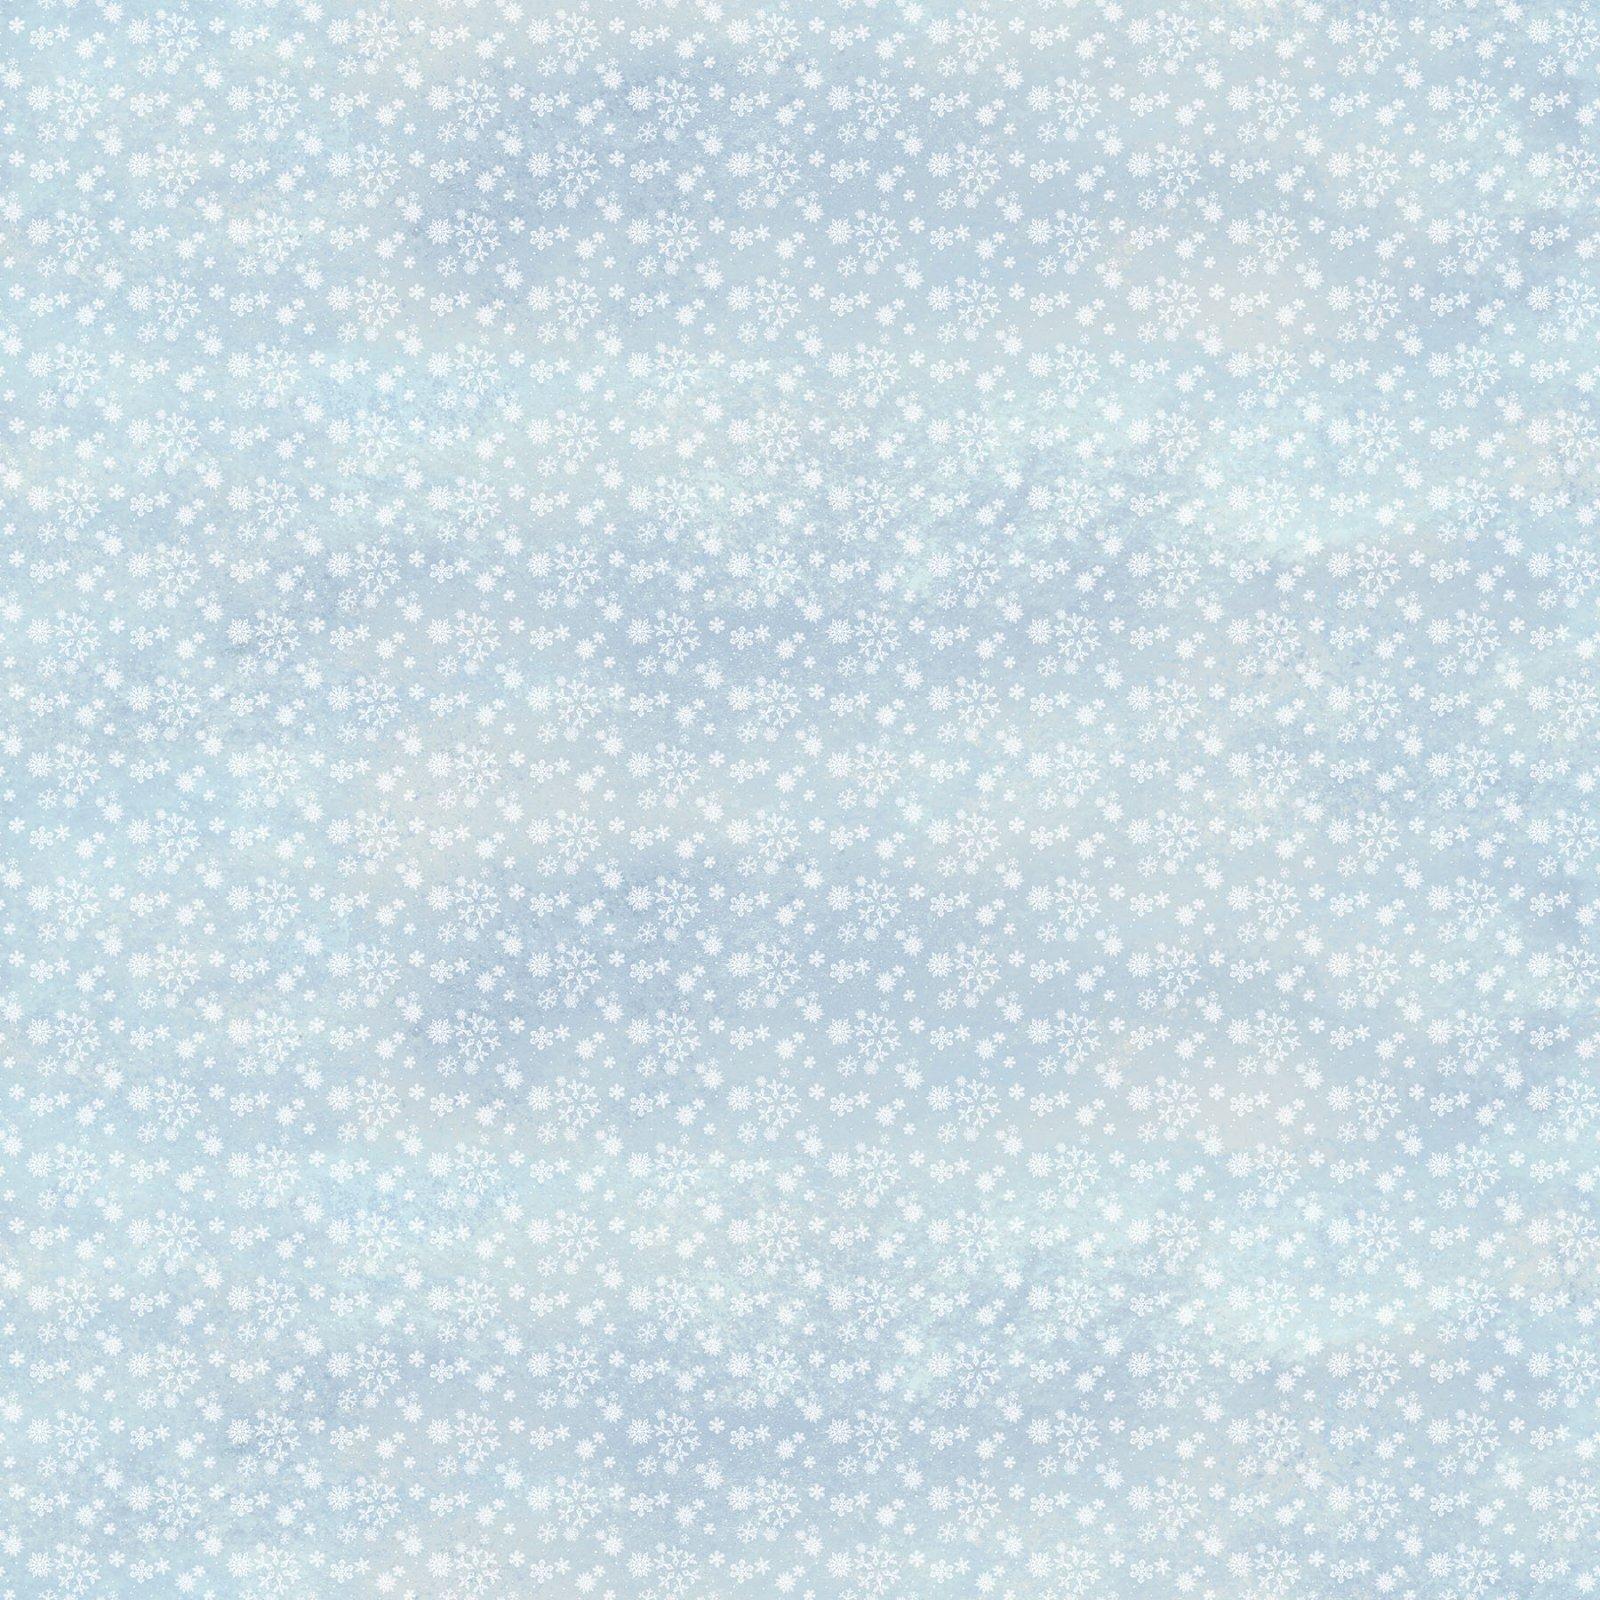 WINTER VILLAGE - SNOWFLAKES - LT. BLUE - 22380 41